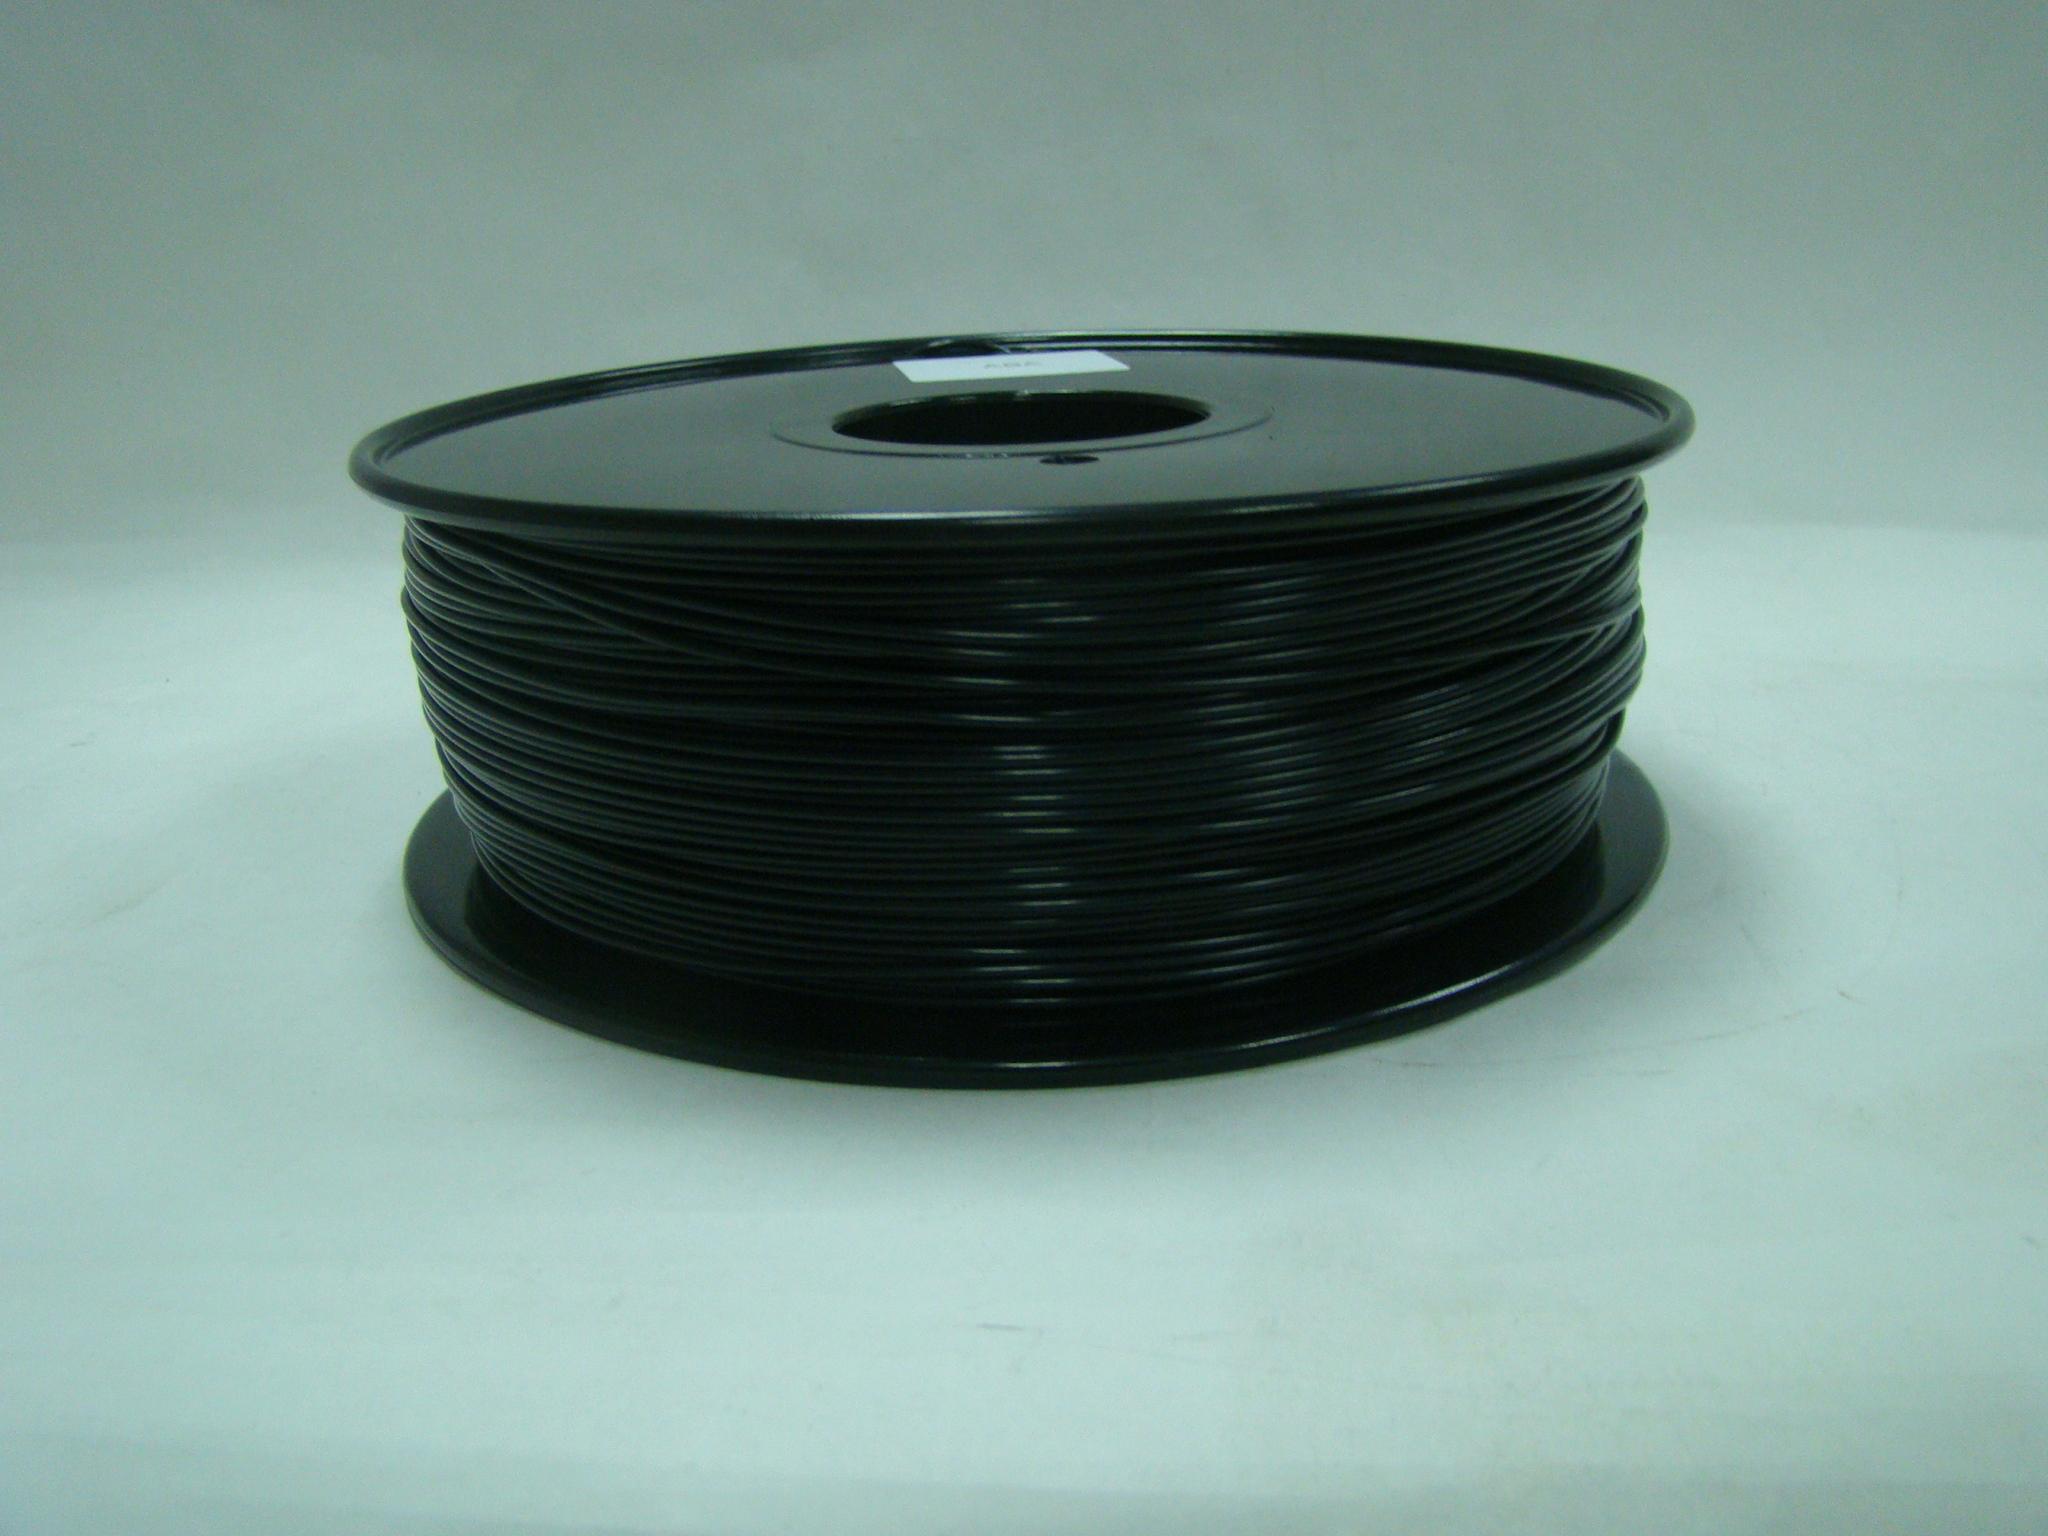 ABS3D打印机耗材/德之健厂家直销三维打印耗材/ABS黑色打印耗材